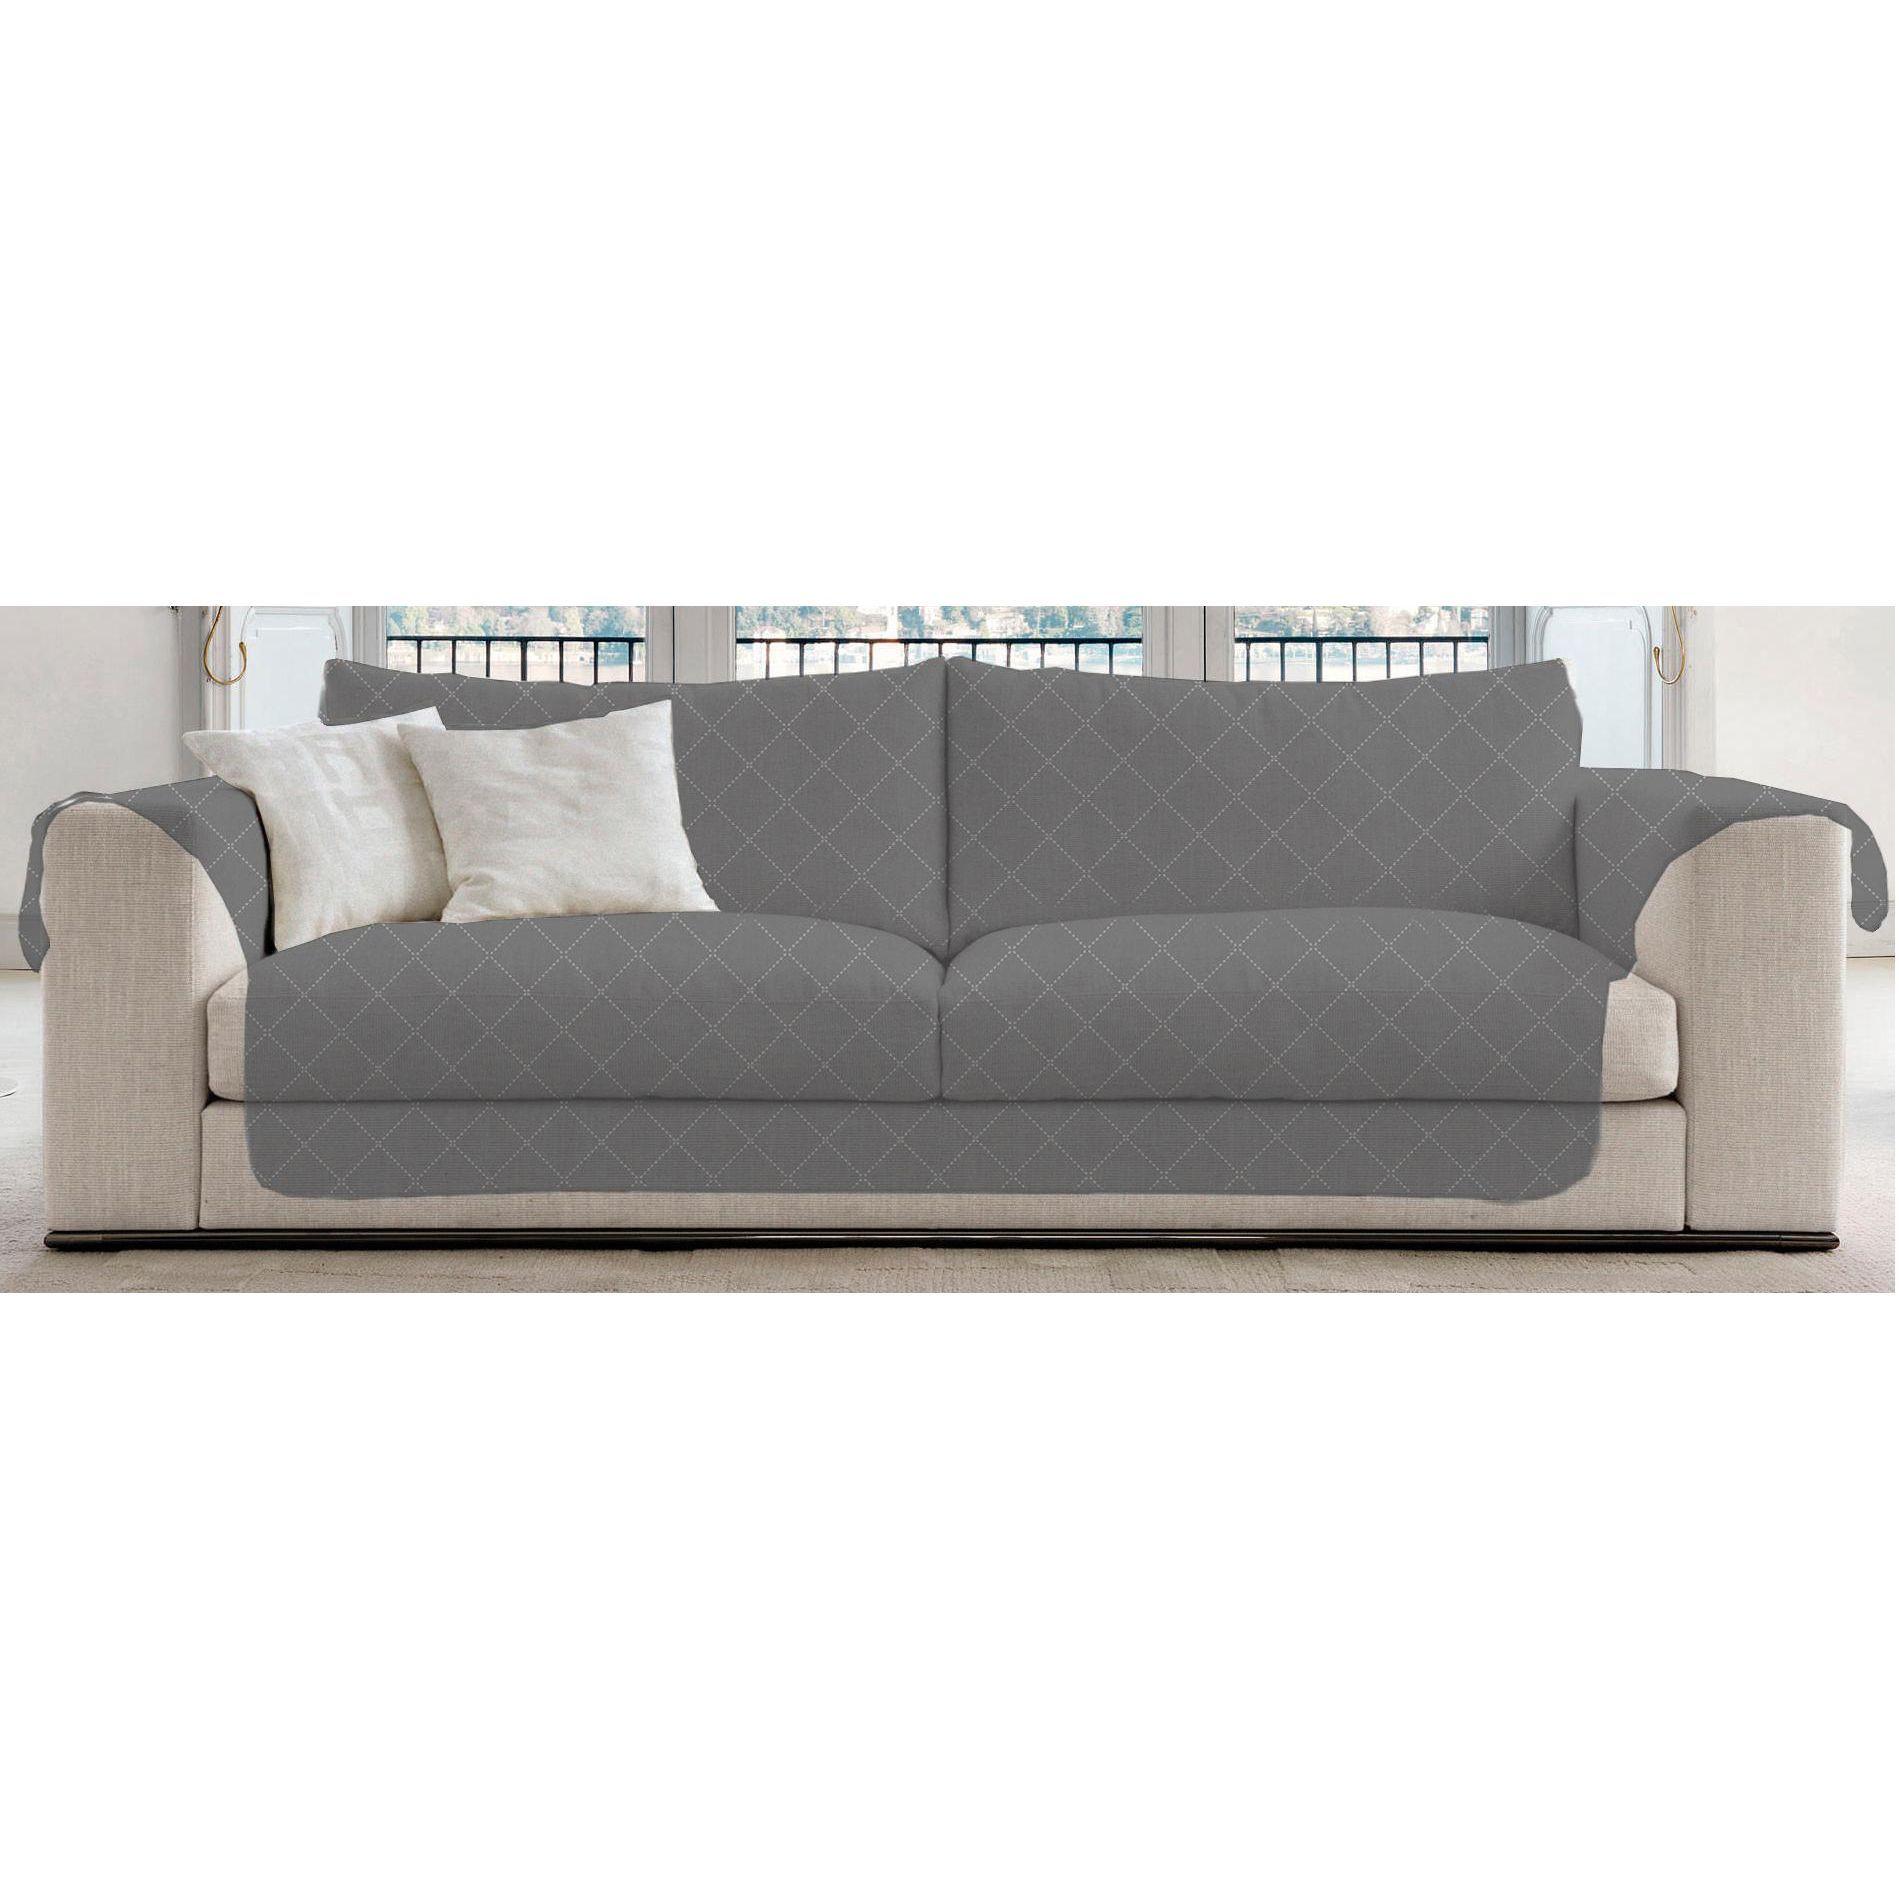 UNIVERSAL Lauren Taylor Diamond quilted Sofa Slipcover Diamond